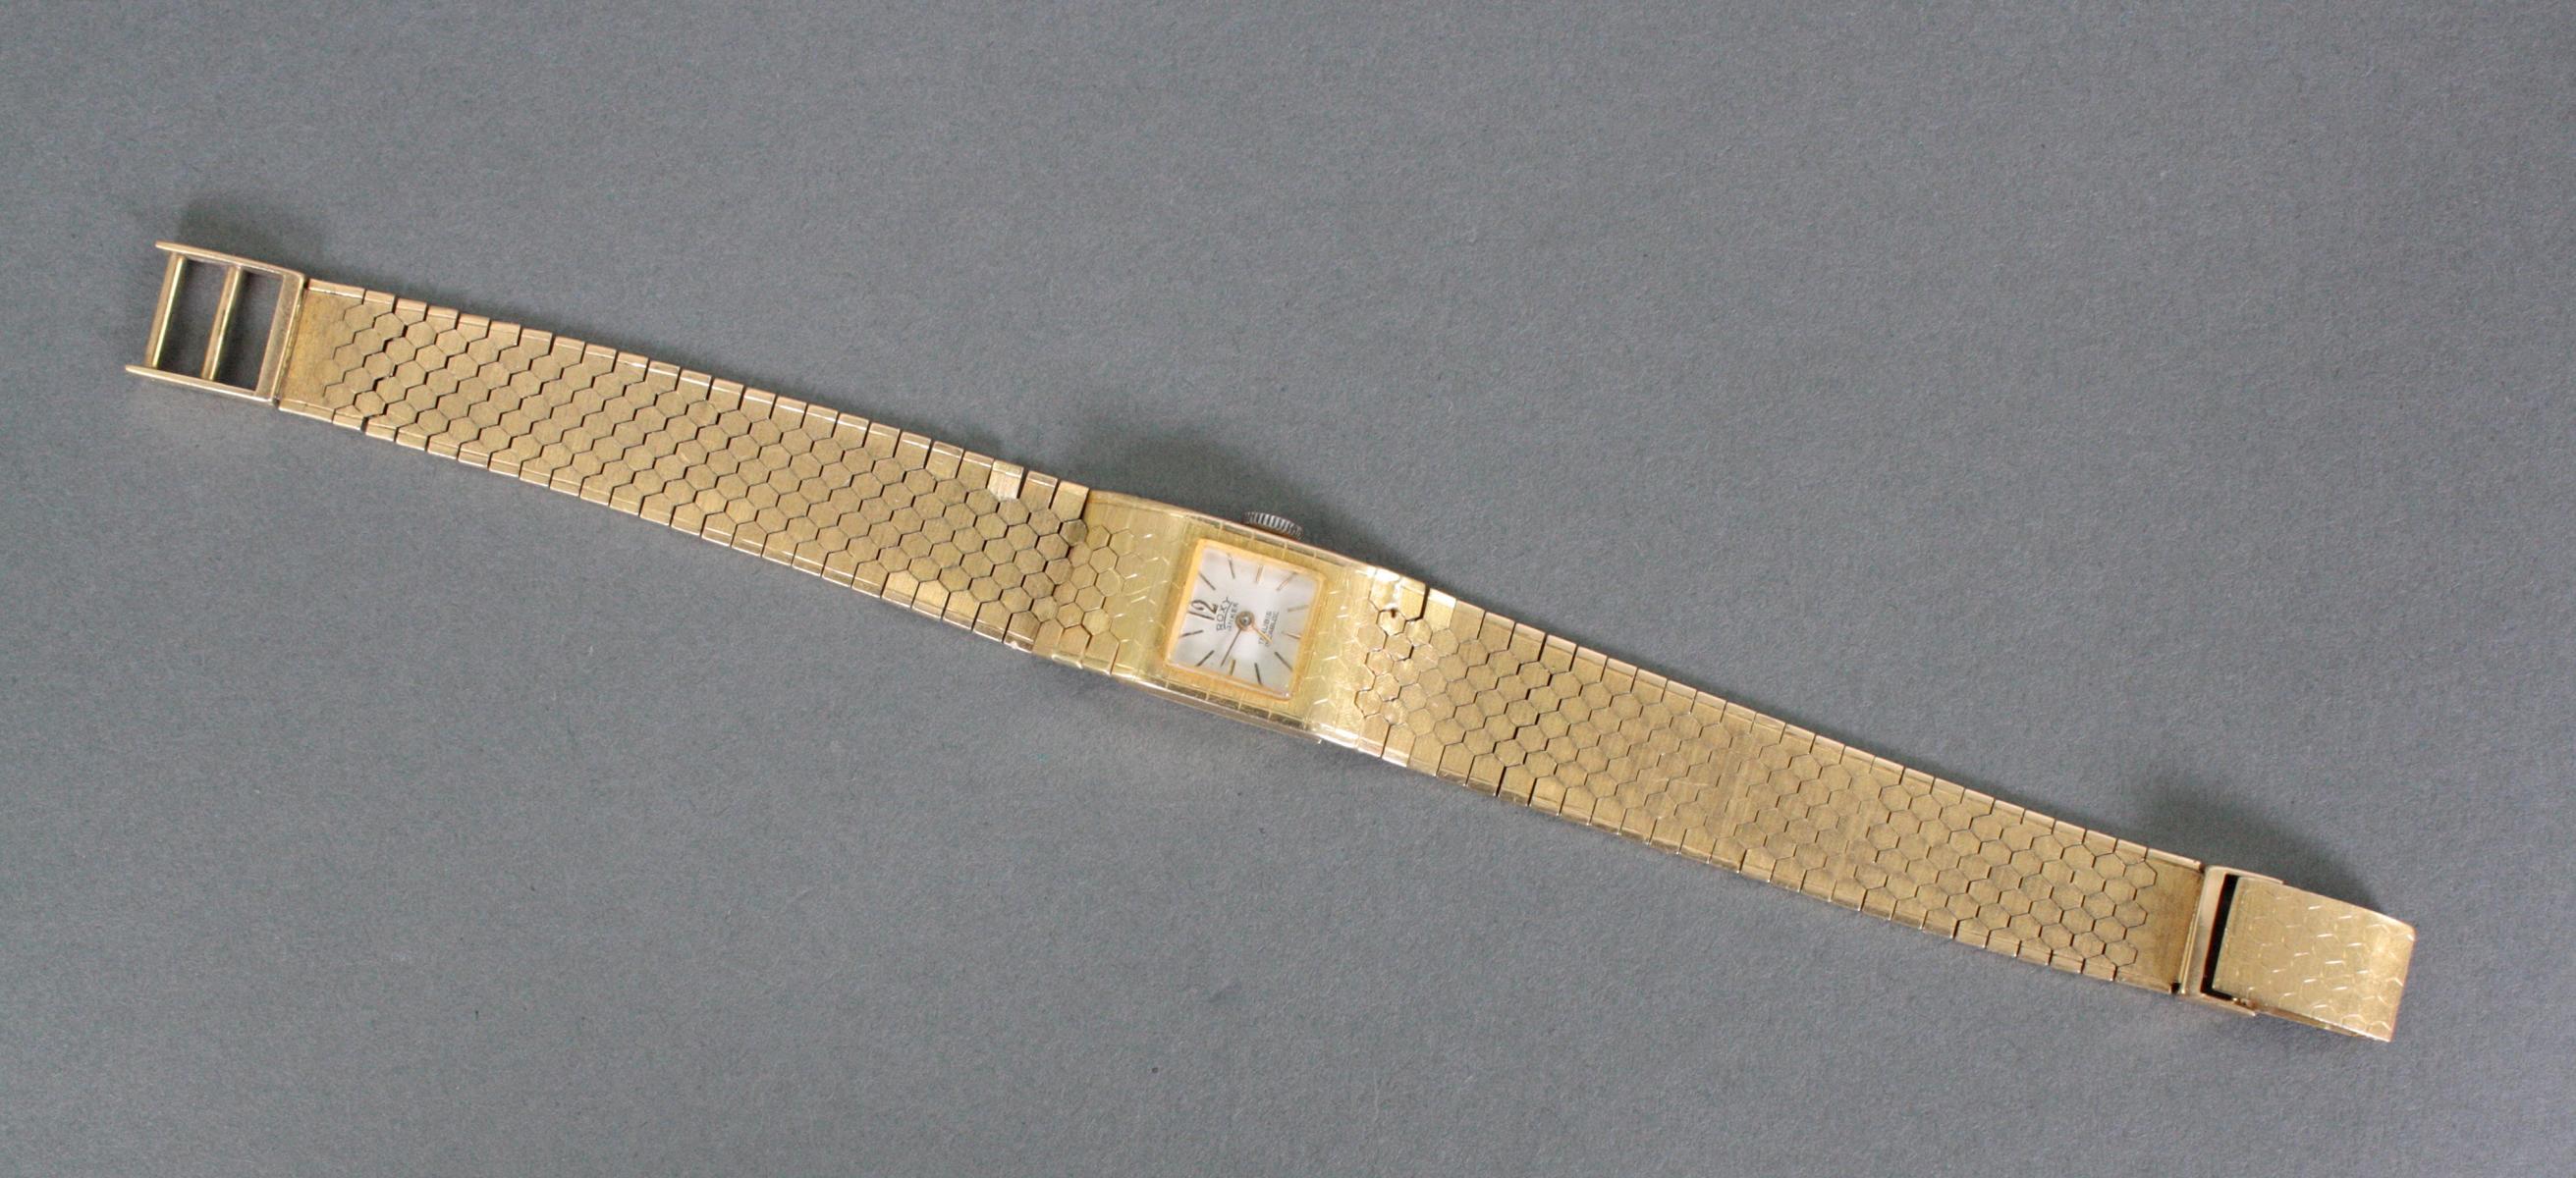 Damenarmbanduhr Roxy Anker, 18 Karat Gelbgold